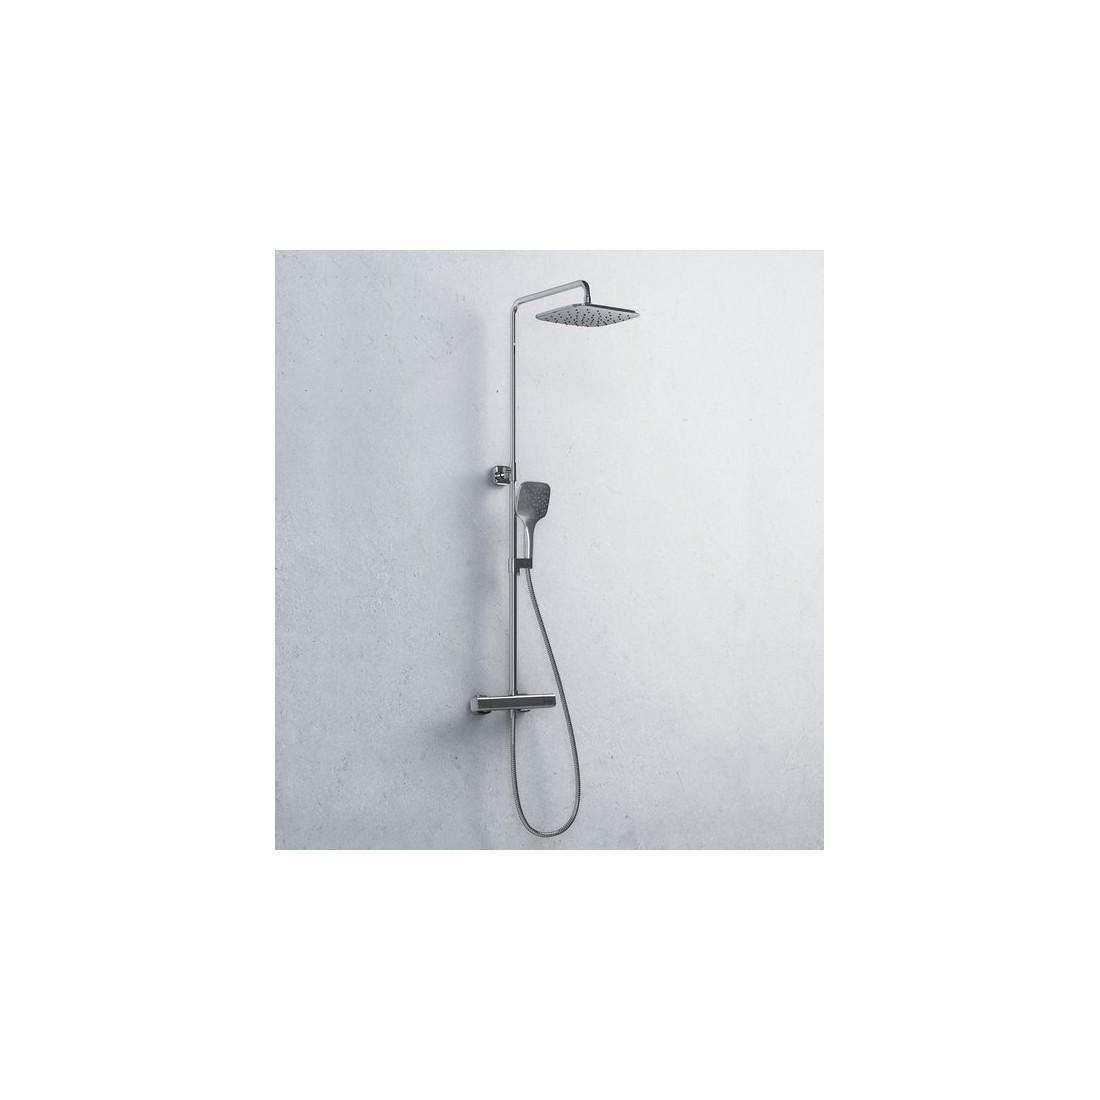 Stacionari dušo sistema Ravak 10°, TD 091.00/150 su termostatiniu maišytuvu ir dušo komplektu